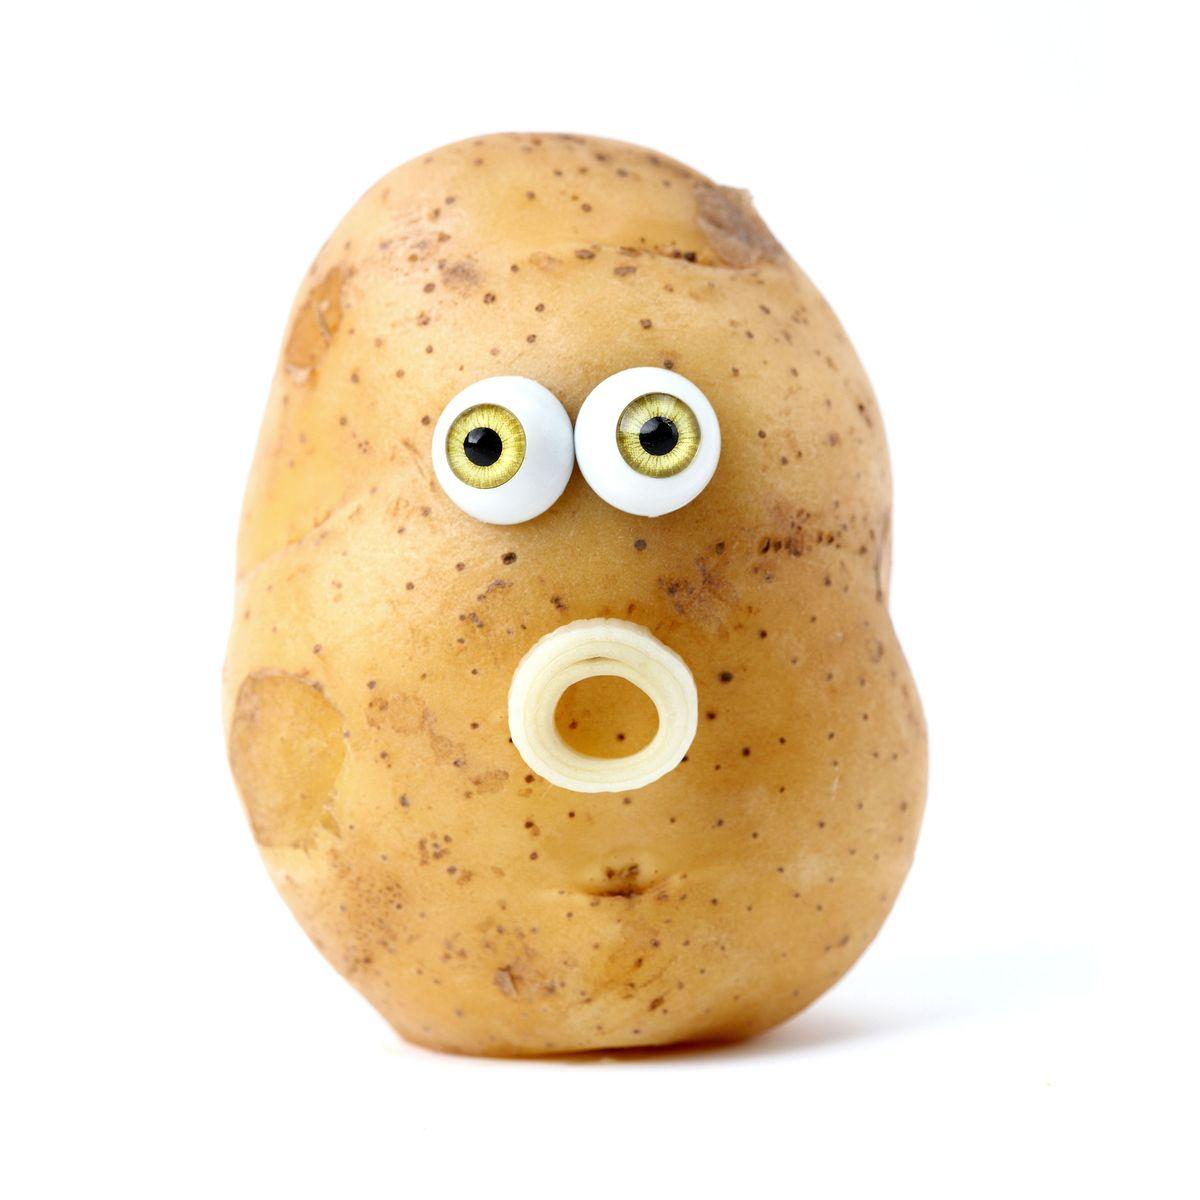 Politisch korrekter Knollendiskurs: Almanis - oder wie nennen wir Kartoffeln?